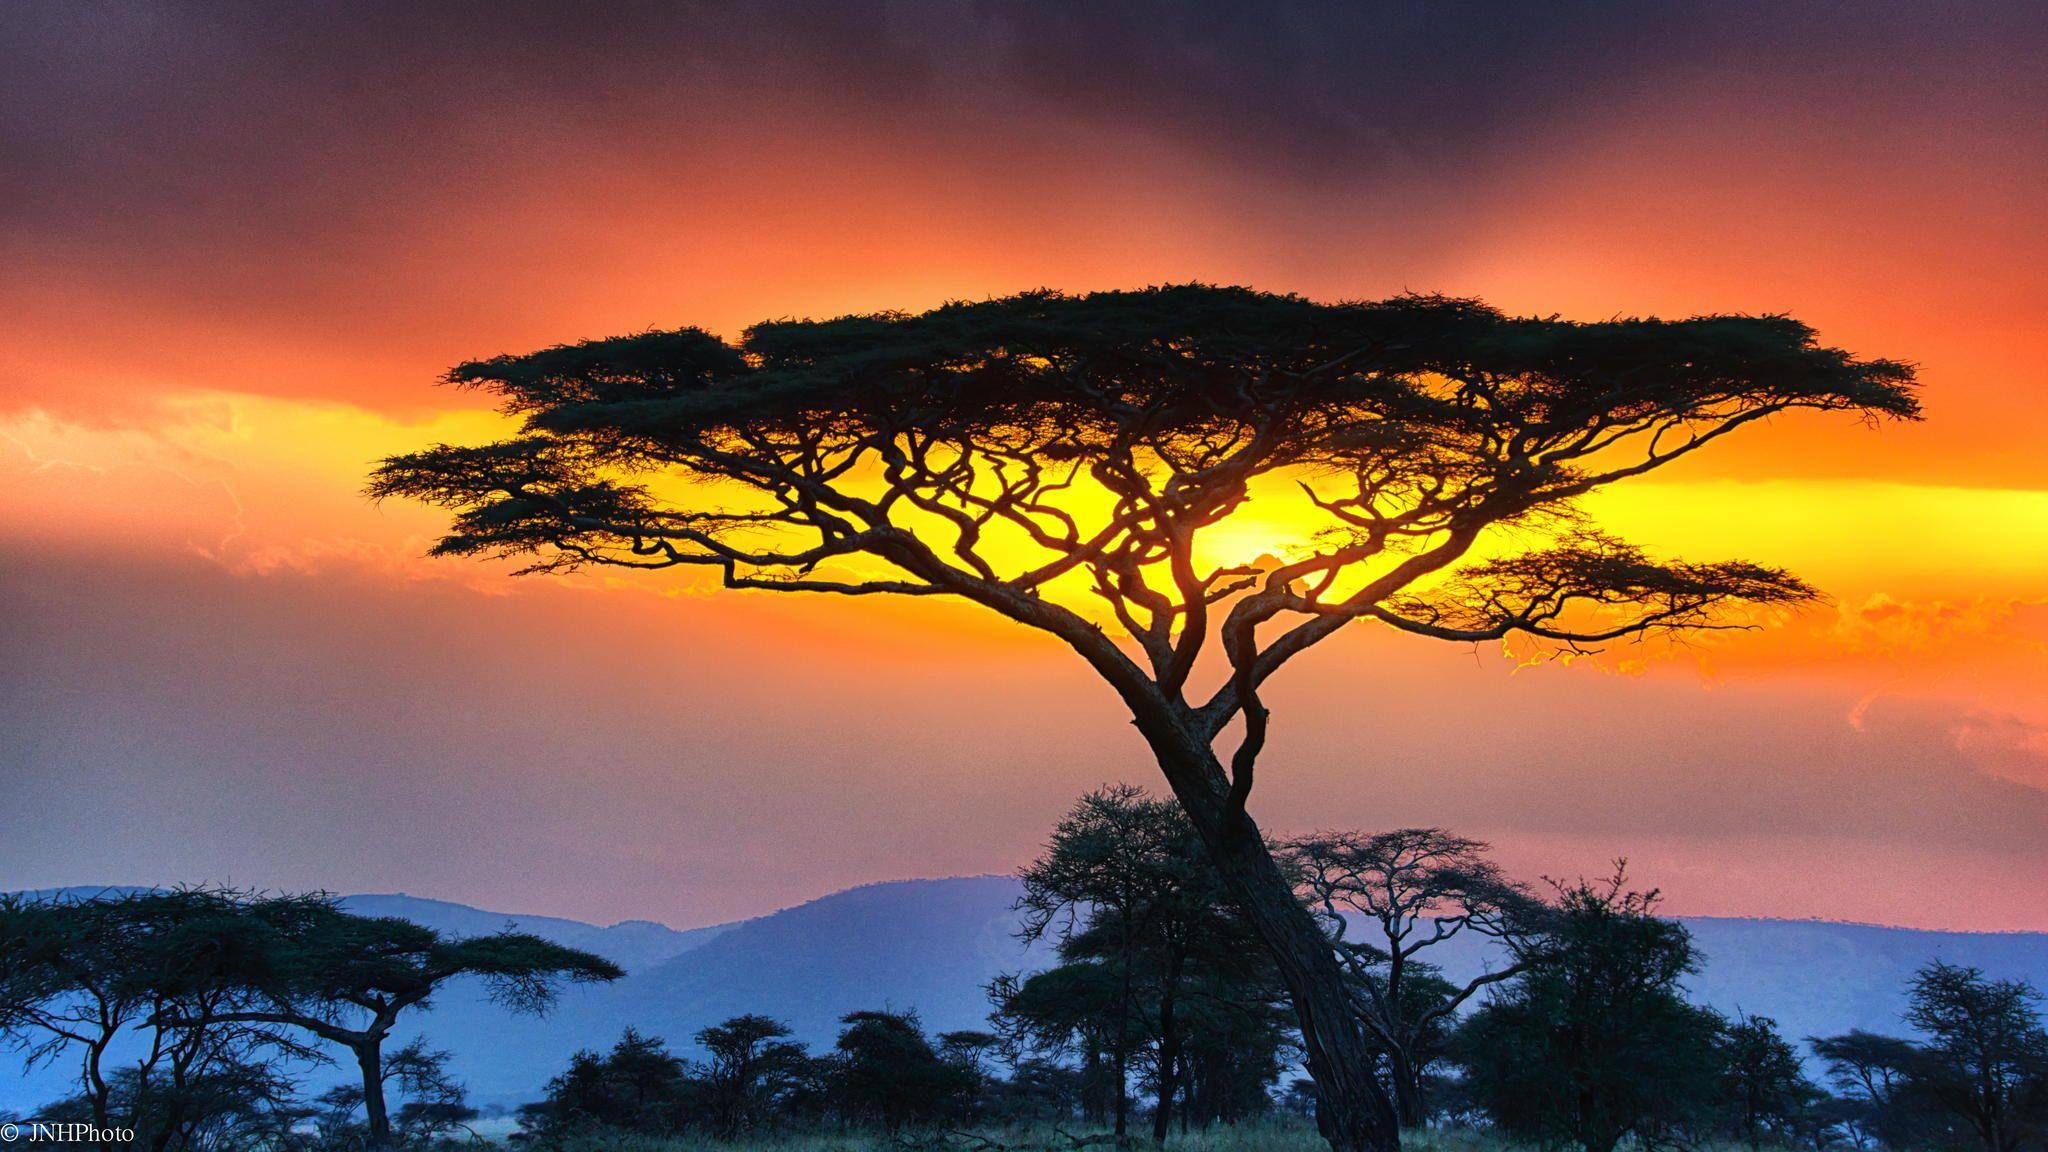 Fall Forest Hd Wallpaper Free Photo Serengeti Sunset Dark Evening Landscape